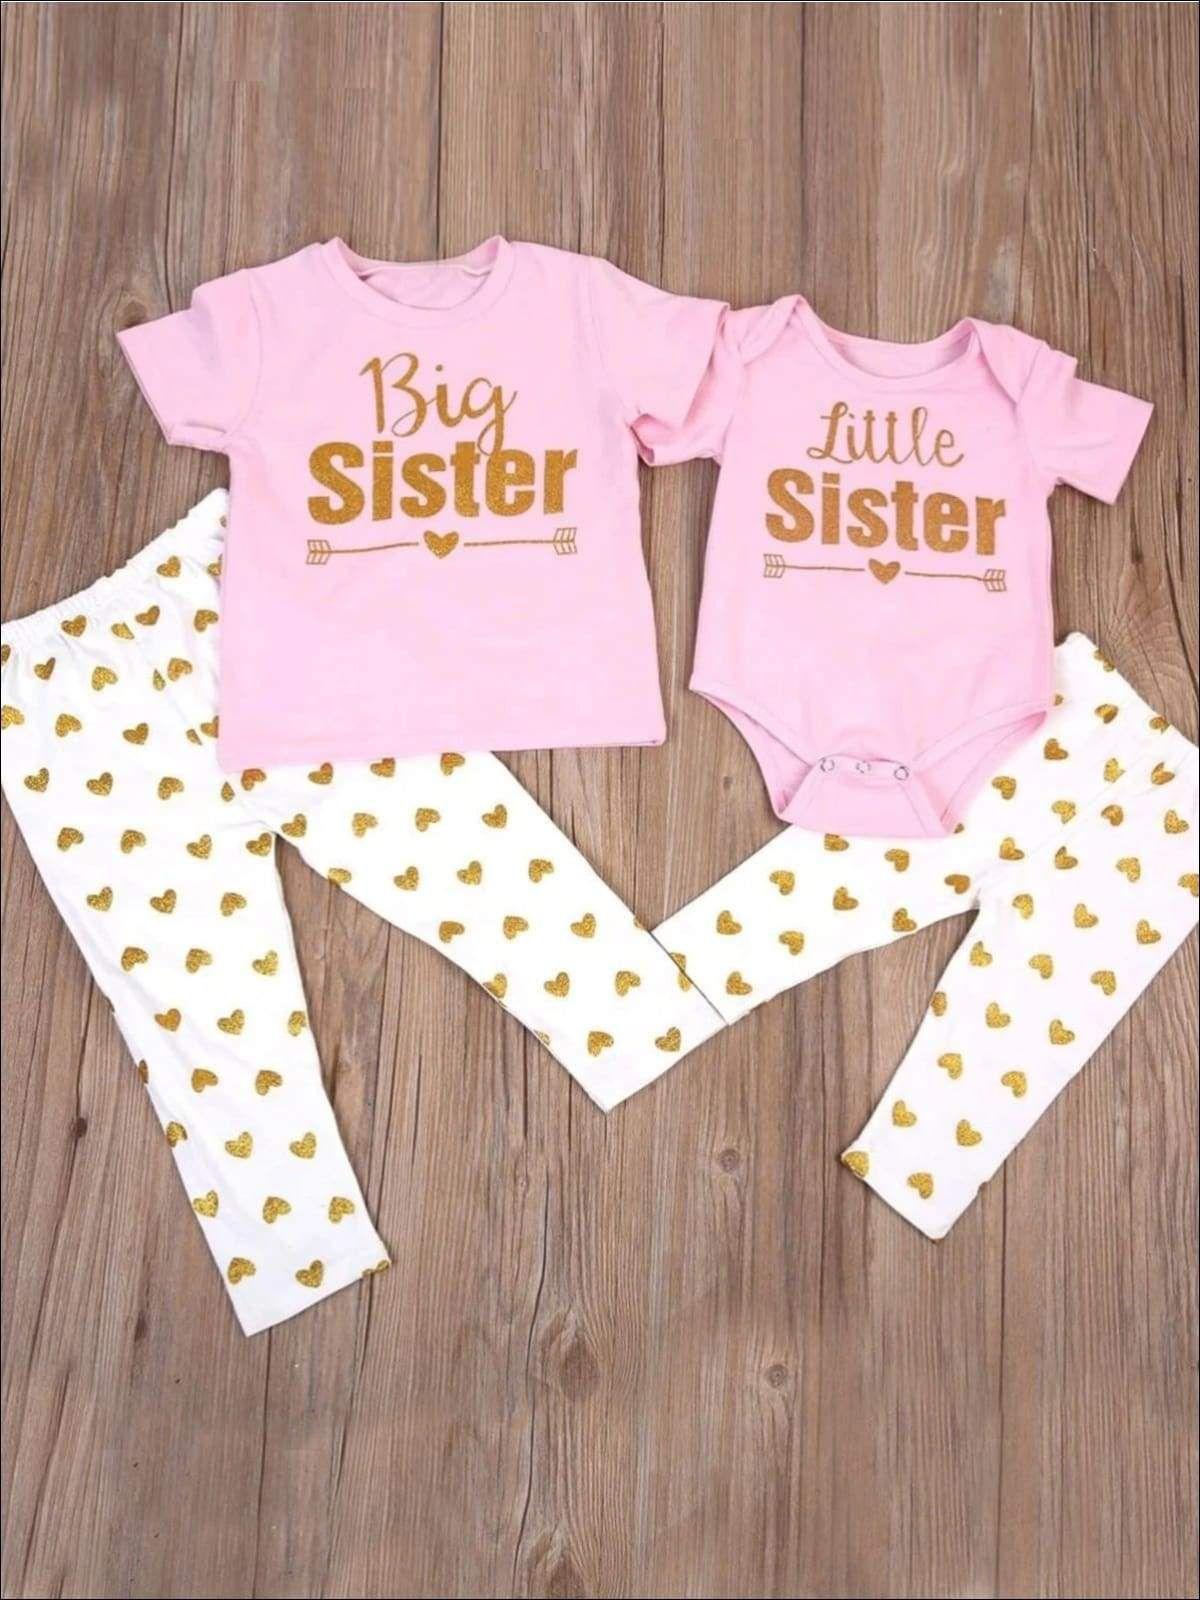 Big Sister Little Sister Matching Shirt And Polka Dot Leggings Set In 2021 Big Sister T Shirt Sister Outfits Big Sister Little Sister